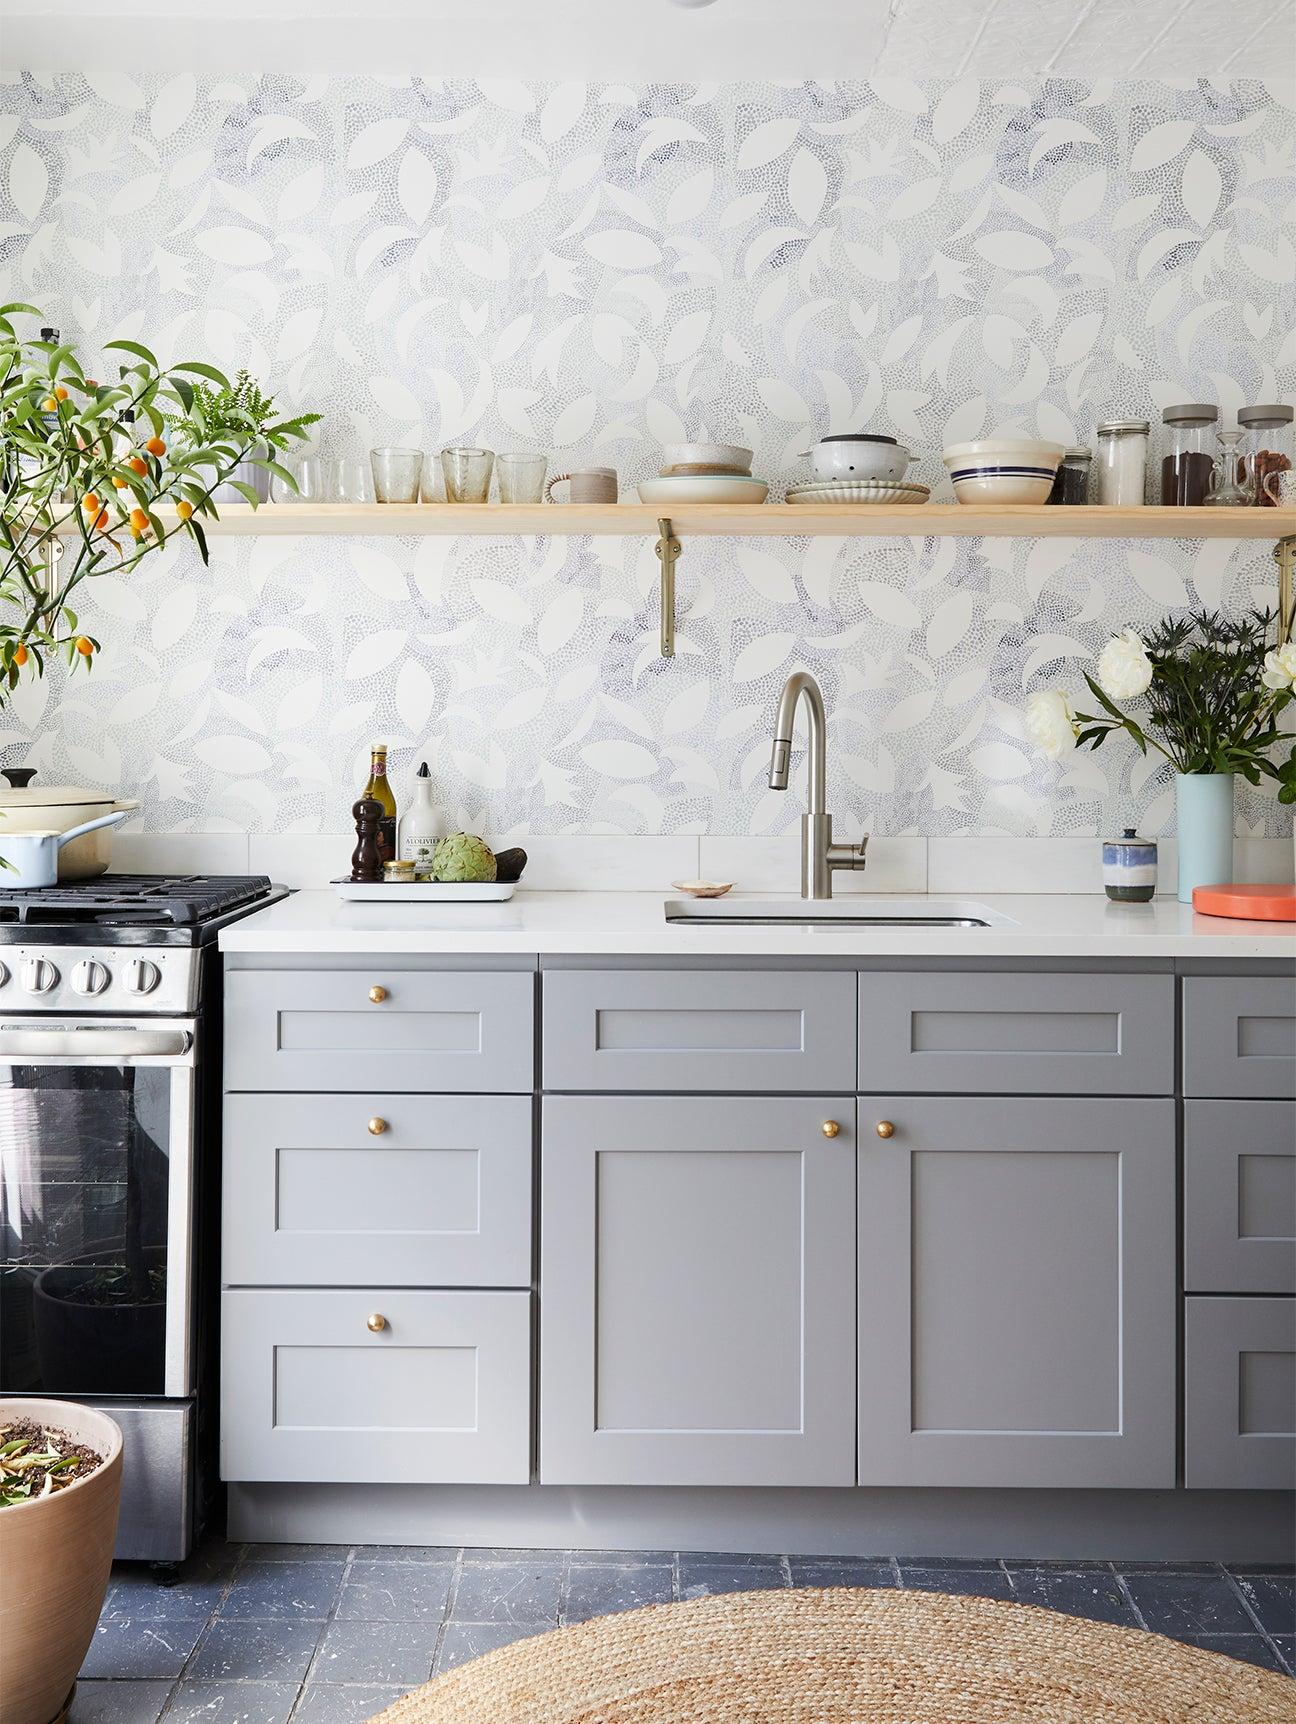 11 Shaker Kitchen Cabinet Ideas That, Shaker Style Kitchen Cabinet Ideas